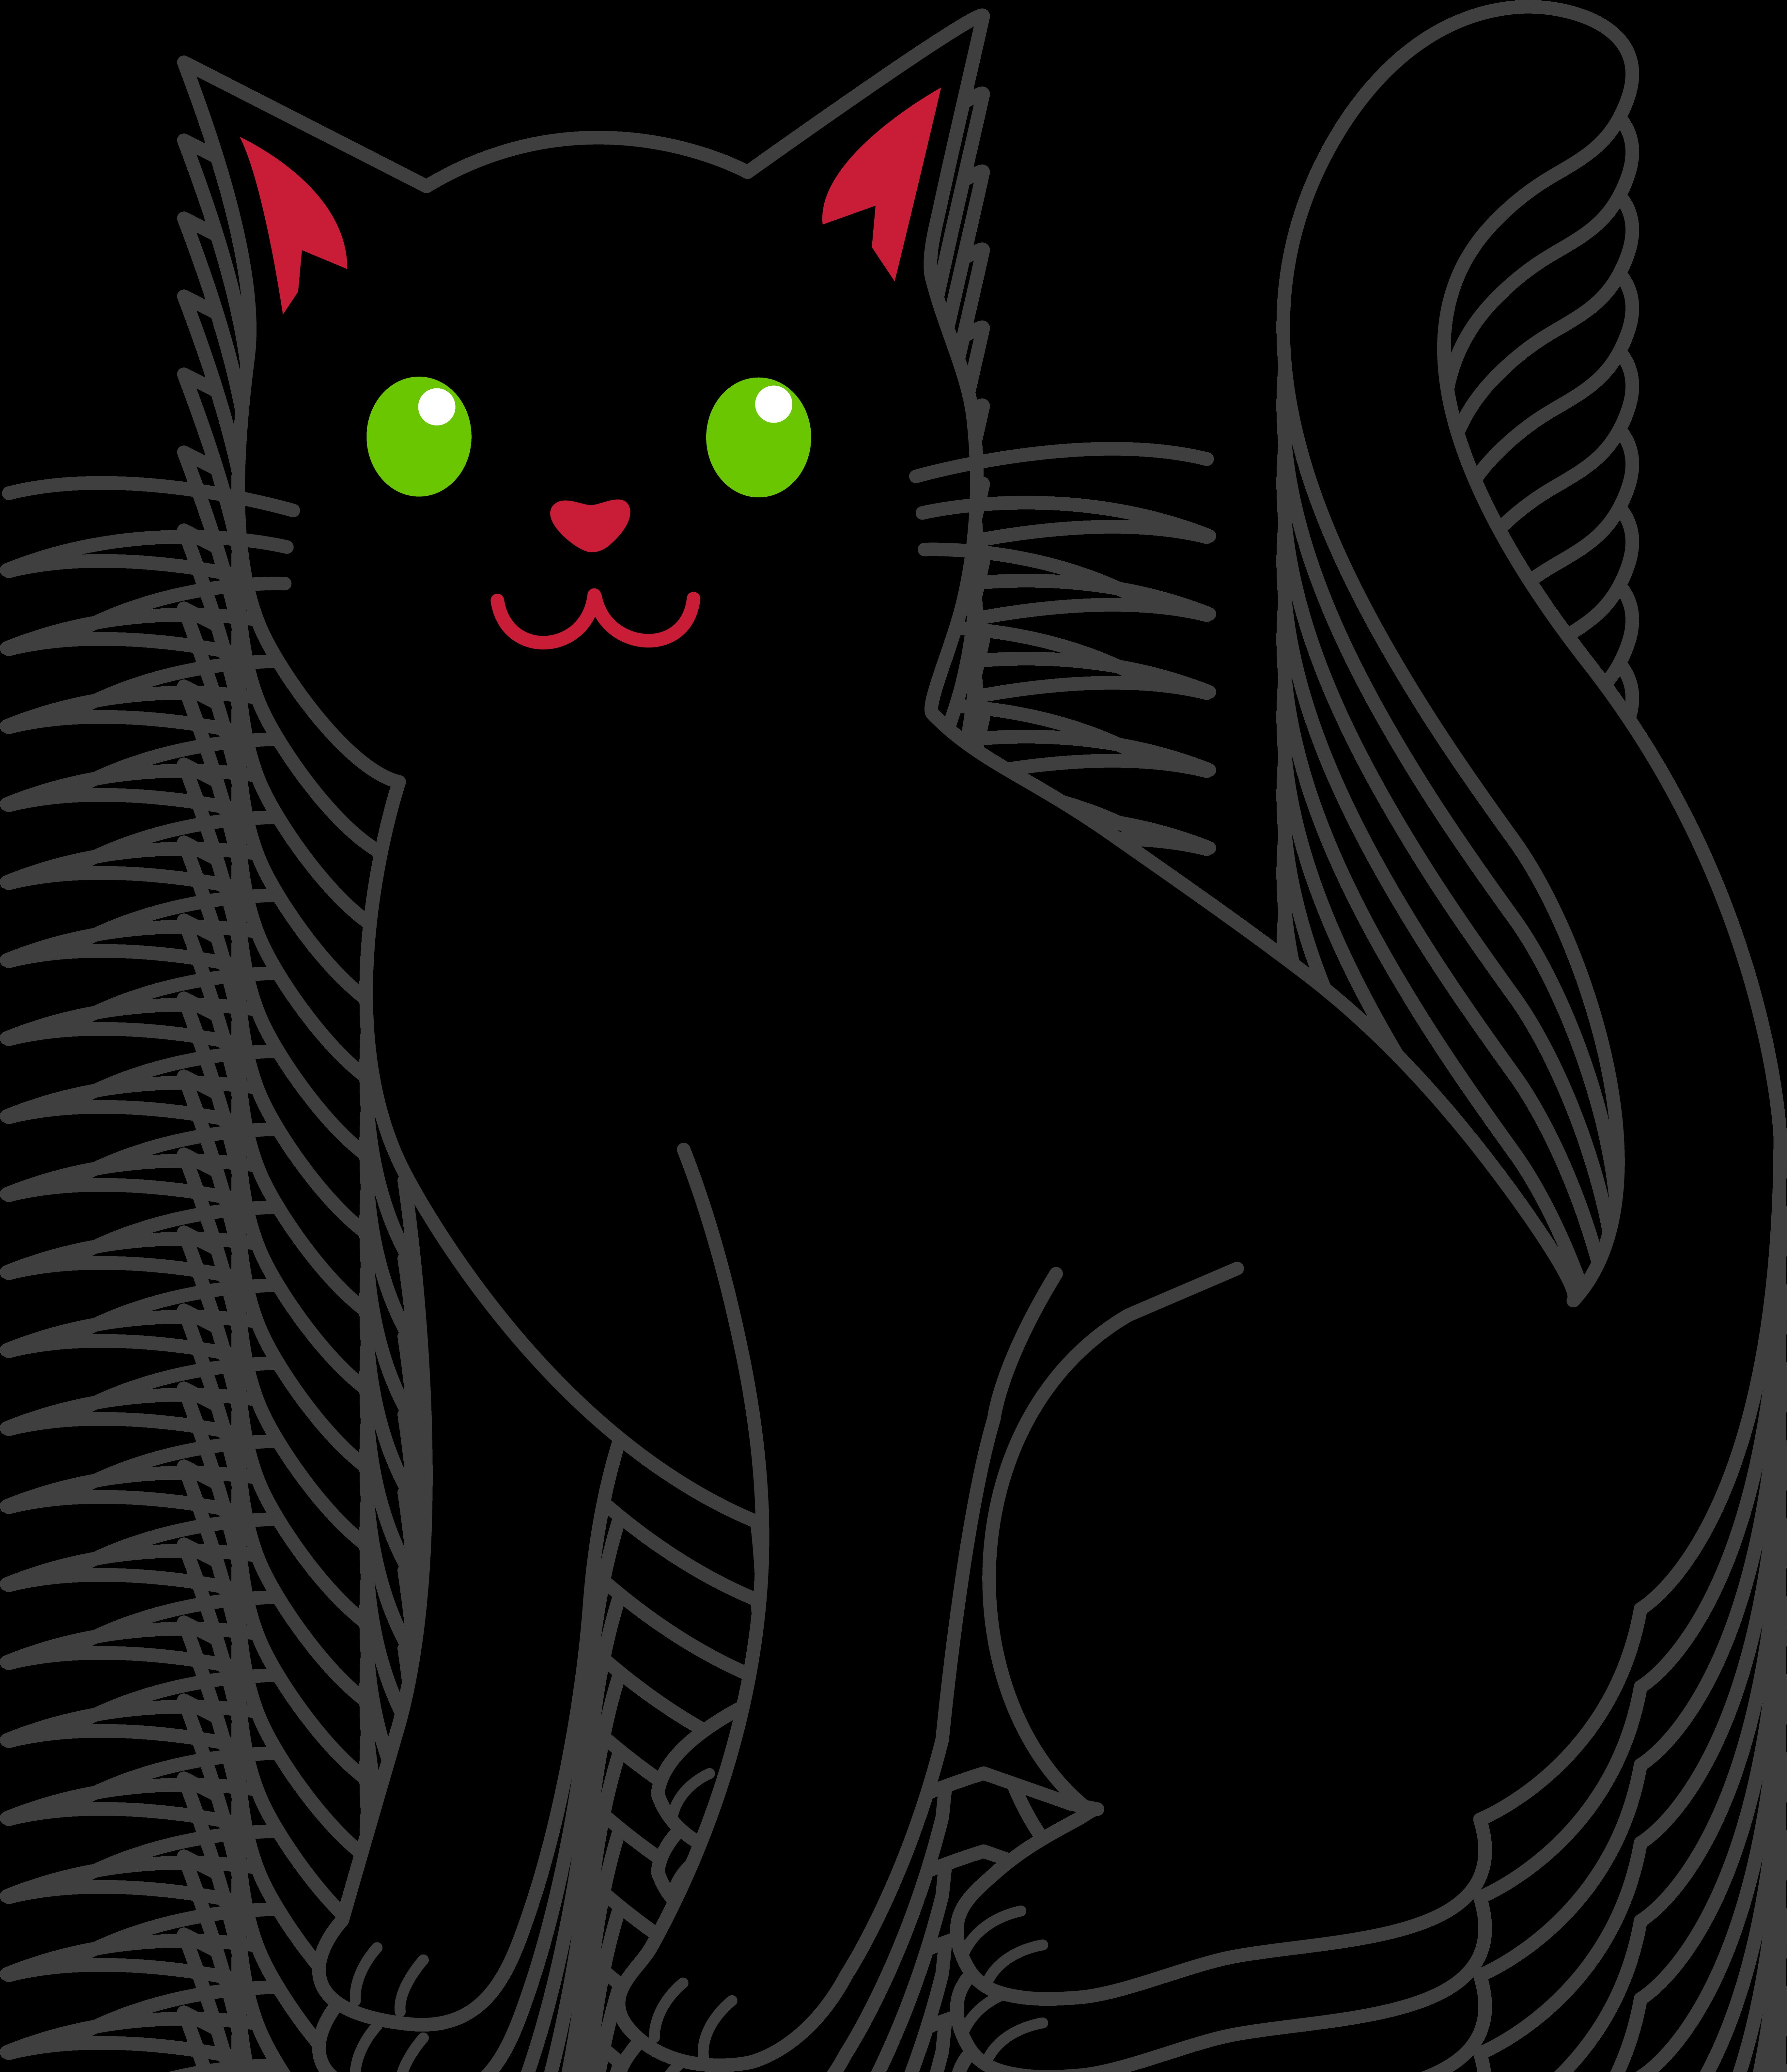 Simple Black Halloween Cat - Free Clip A-Simple Black Halloween Cat - Free Clip Art-16